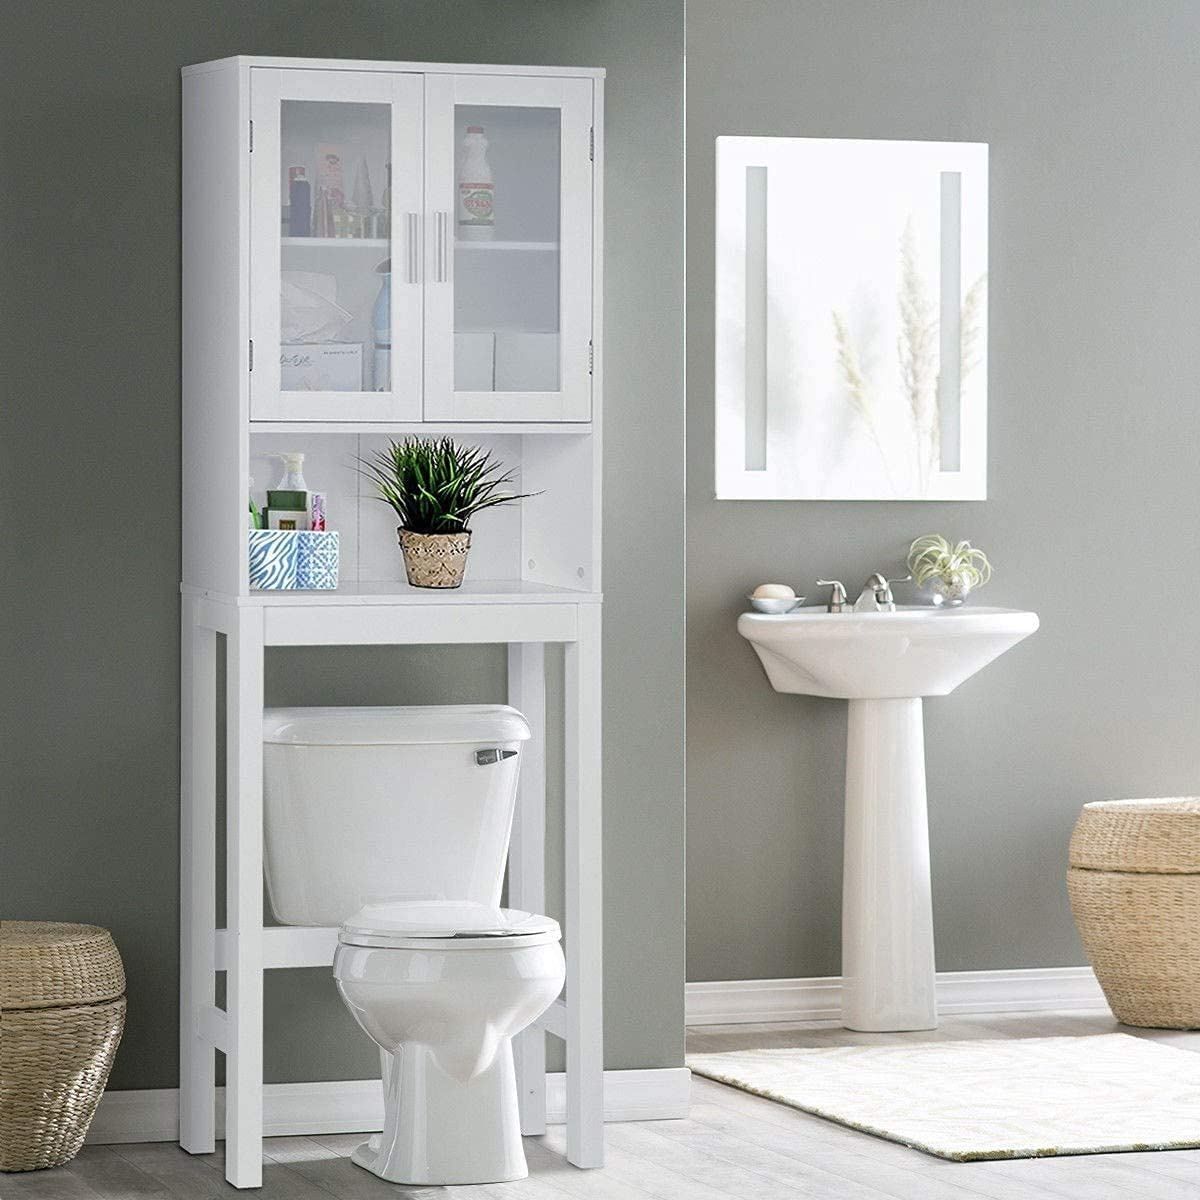 BestComfort Japan's largest assortment Wooden Over The Toilet Cabinet Bathroo Home Under blast sales Storage